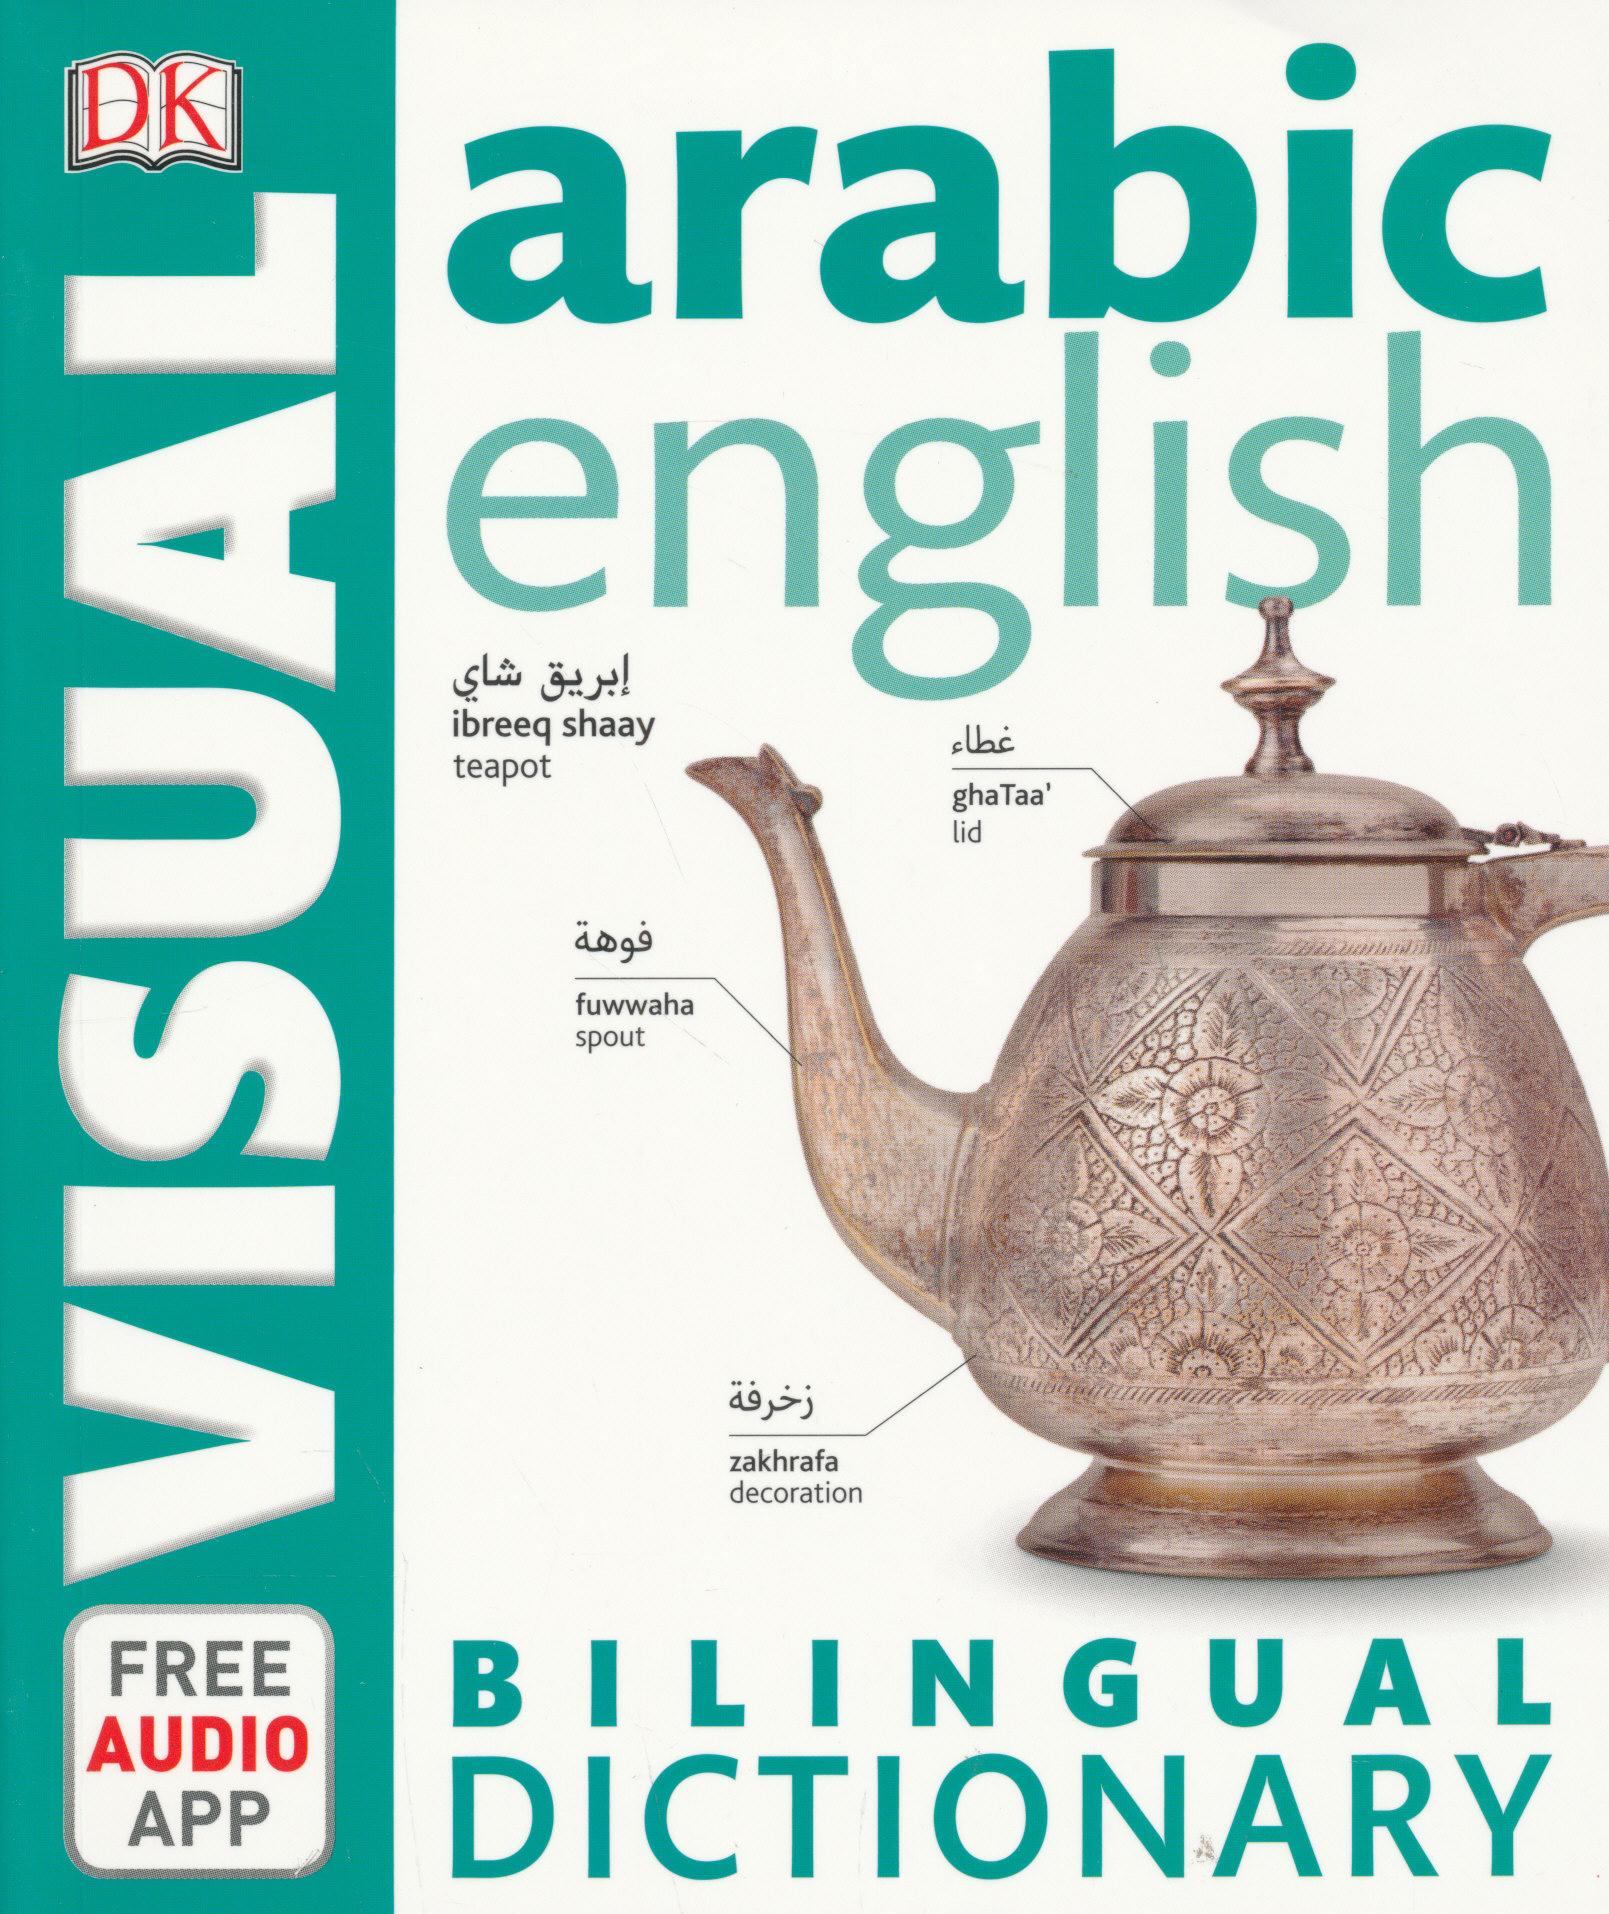 DK Arabic-English Visual Bilingual Dictionary 2017 with Free Audio App